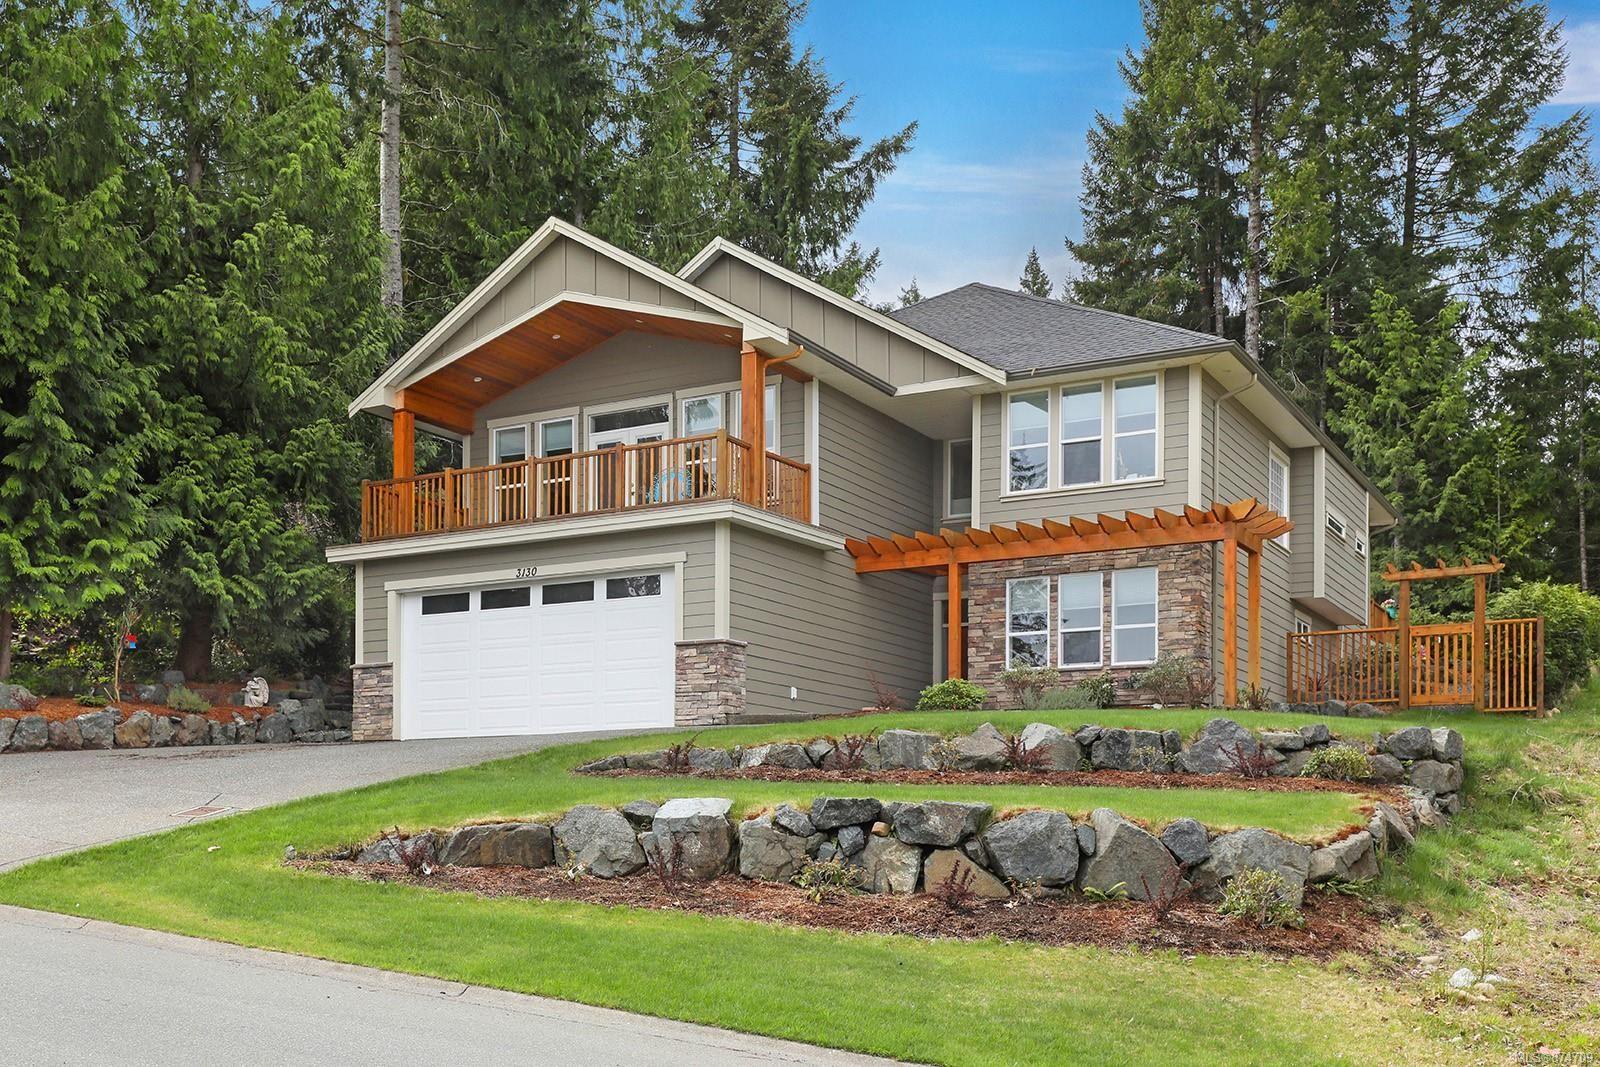 Main Photo: 3130 Klanawa Cres in : CV Courtenay East House for sale (Comox Valley)  : MLS®# 874709